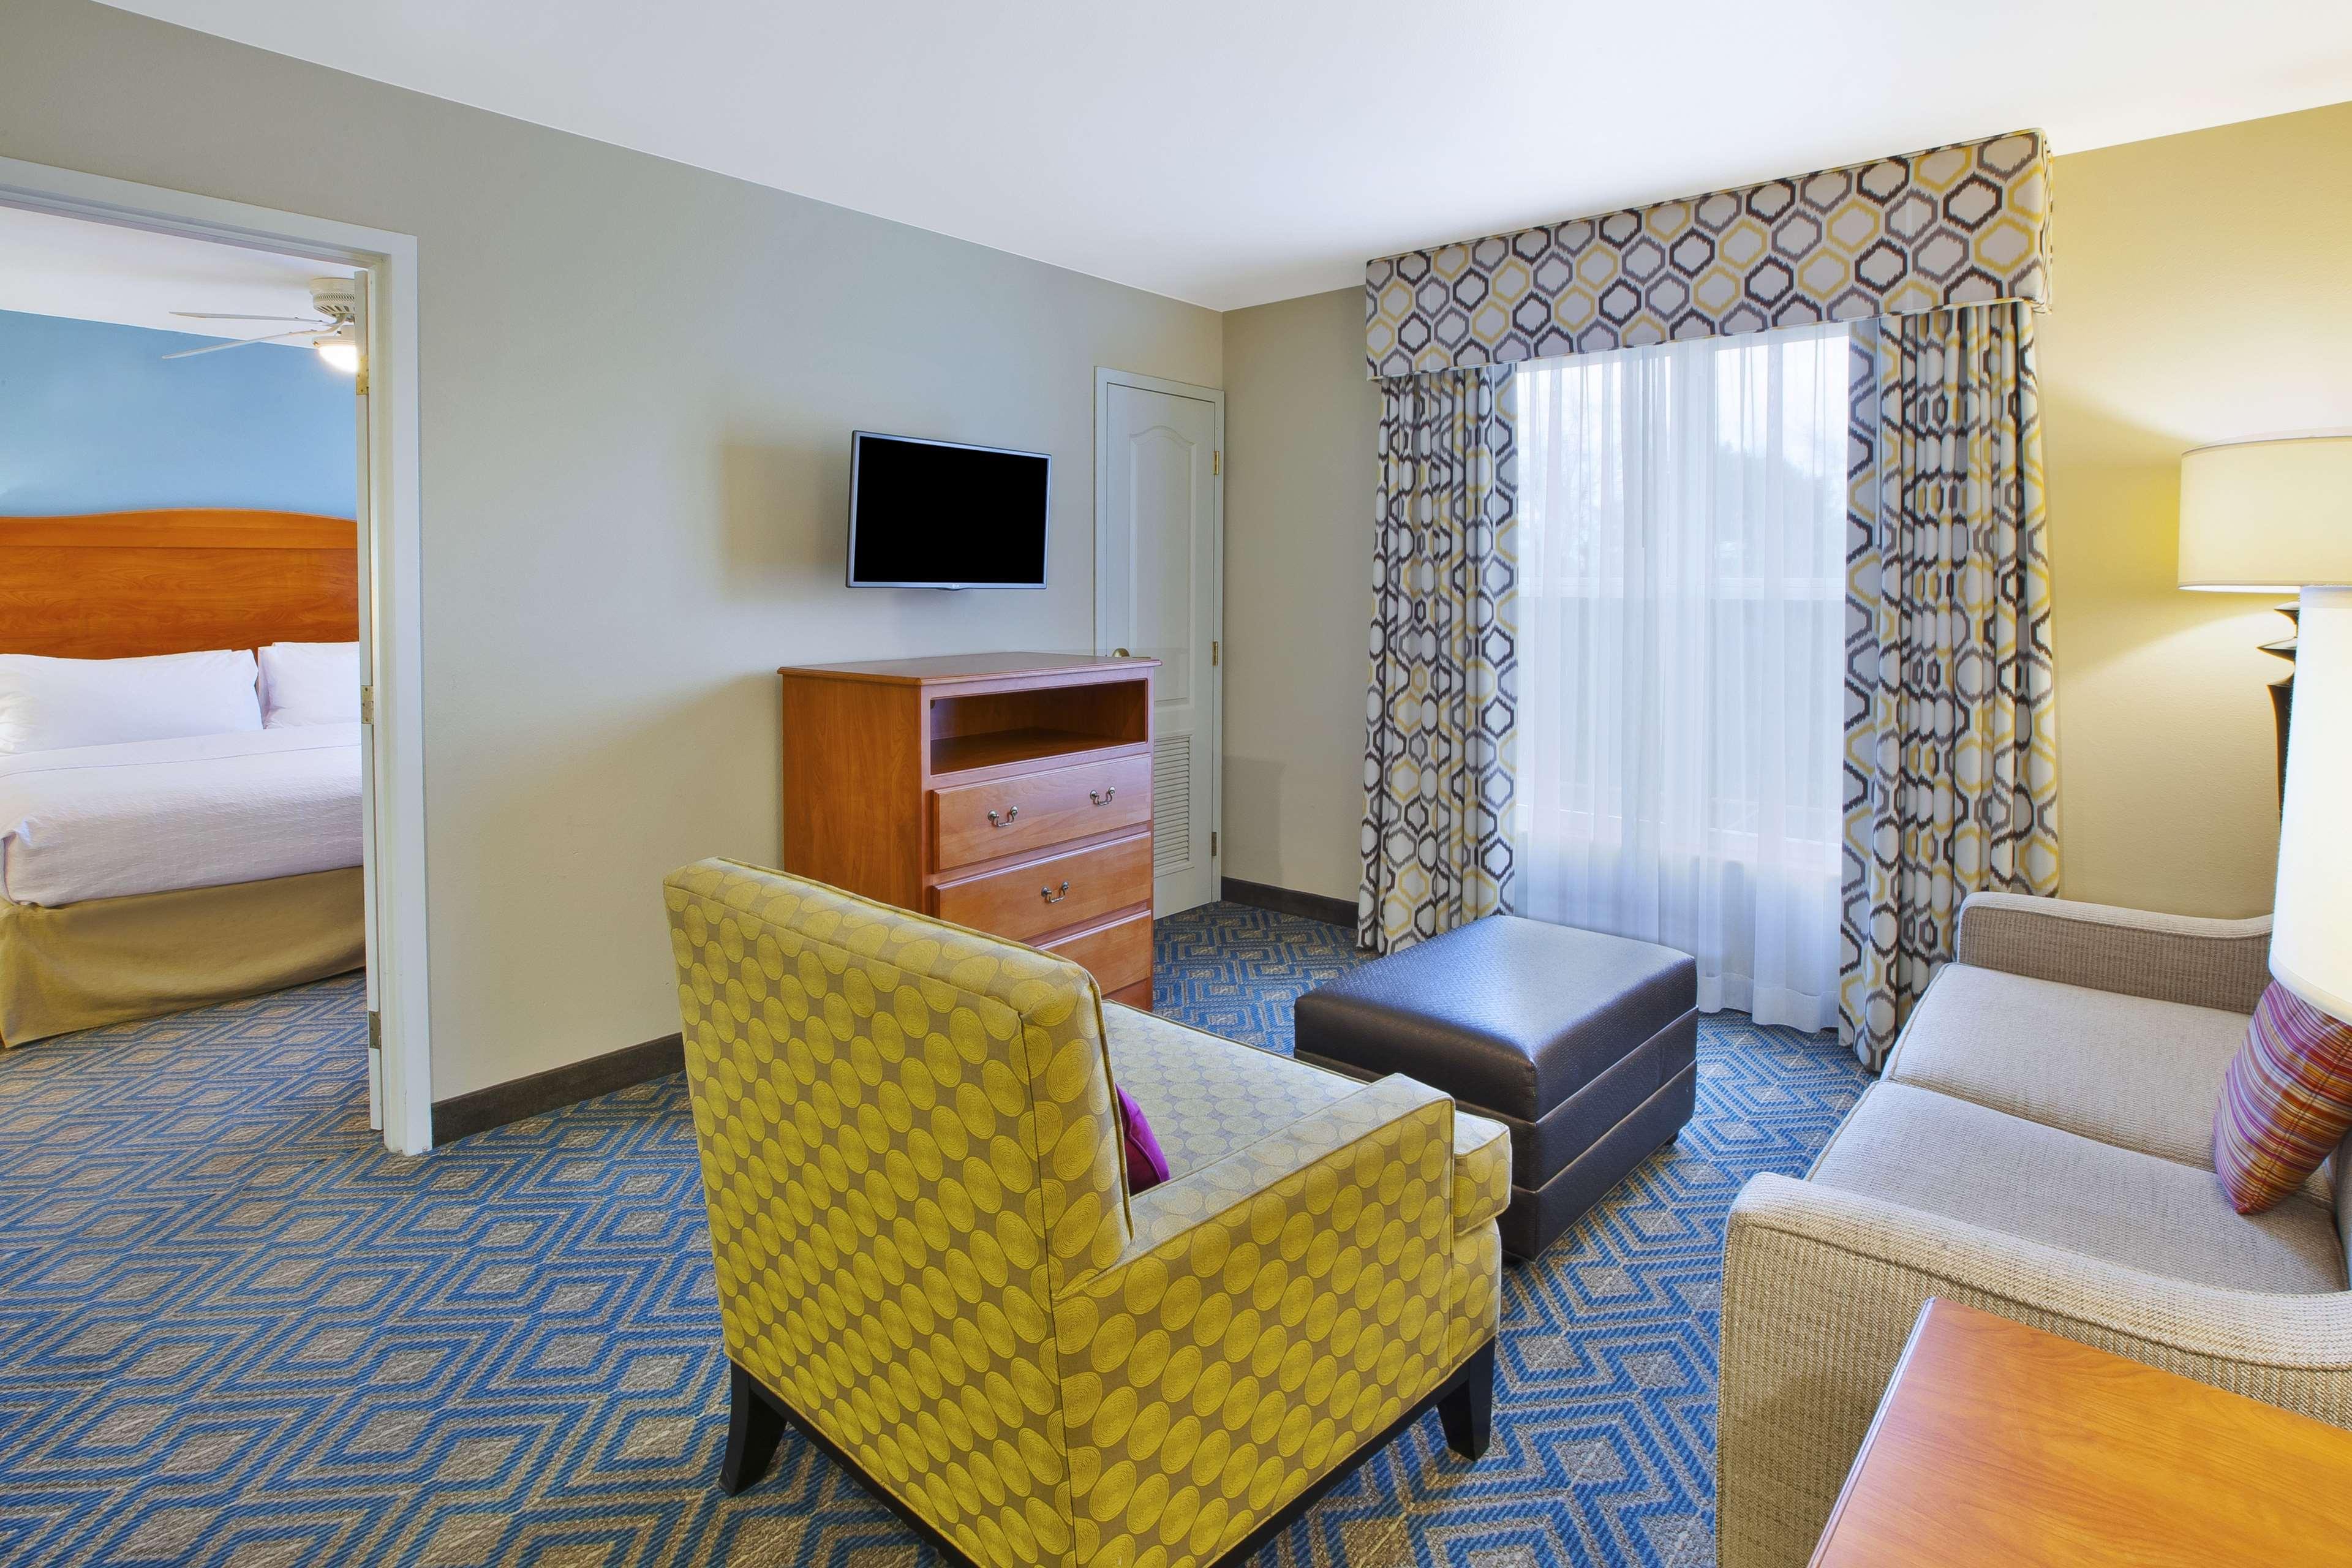 Homewood Suites by Hilton Philadelphia/Mt. Laurel image 20